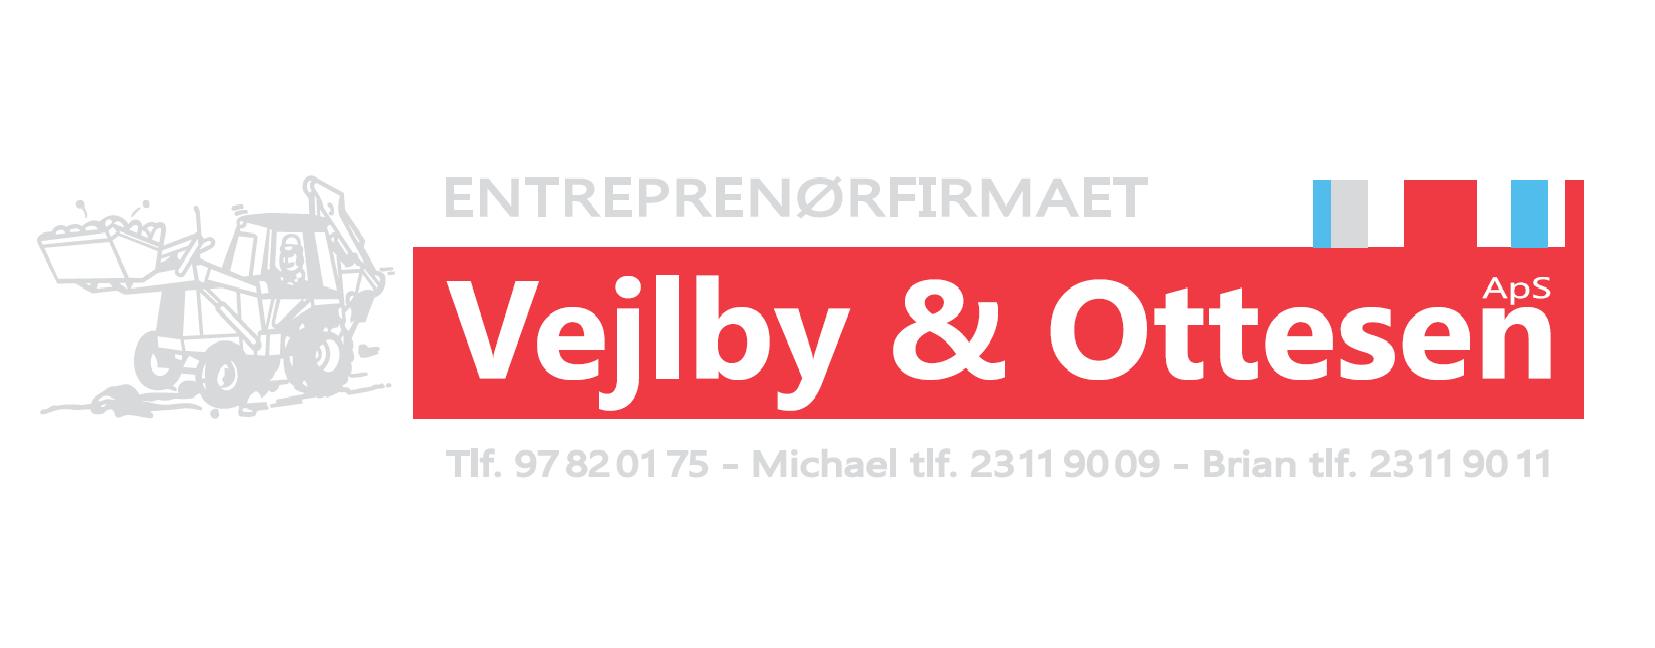 Vejlby & Ottesen